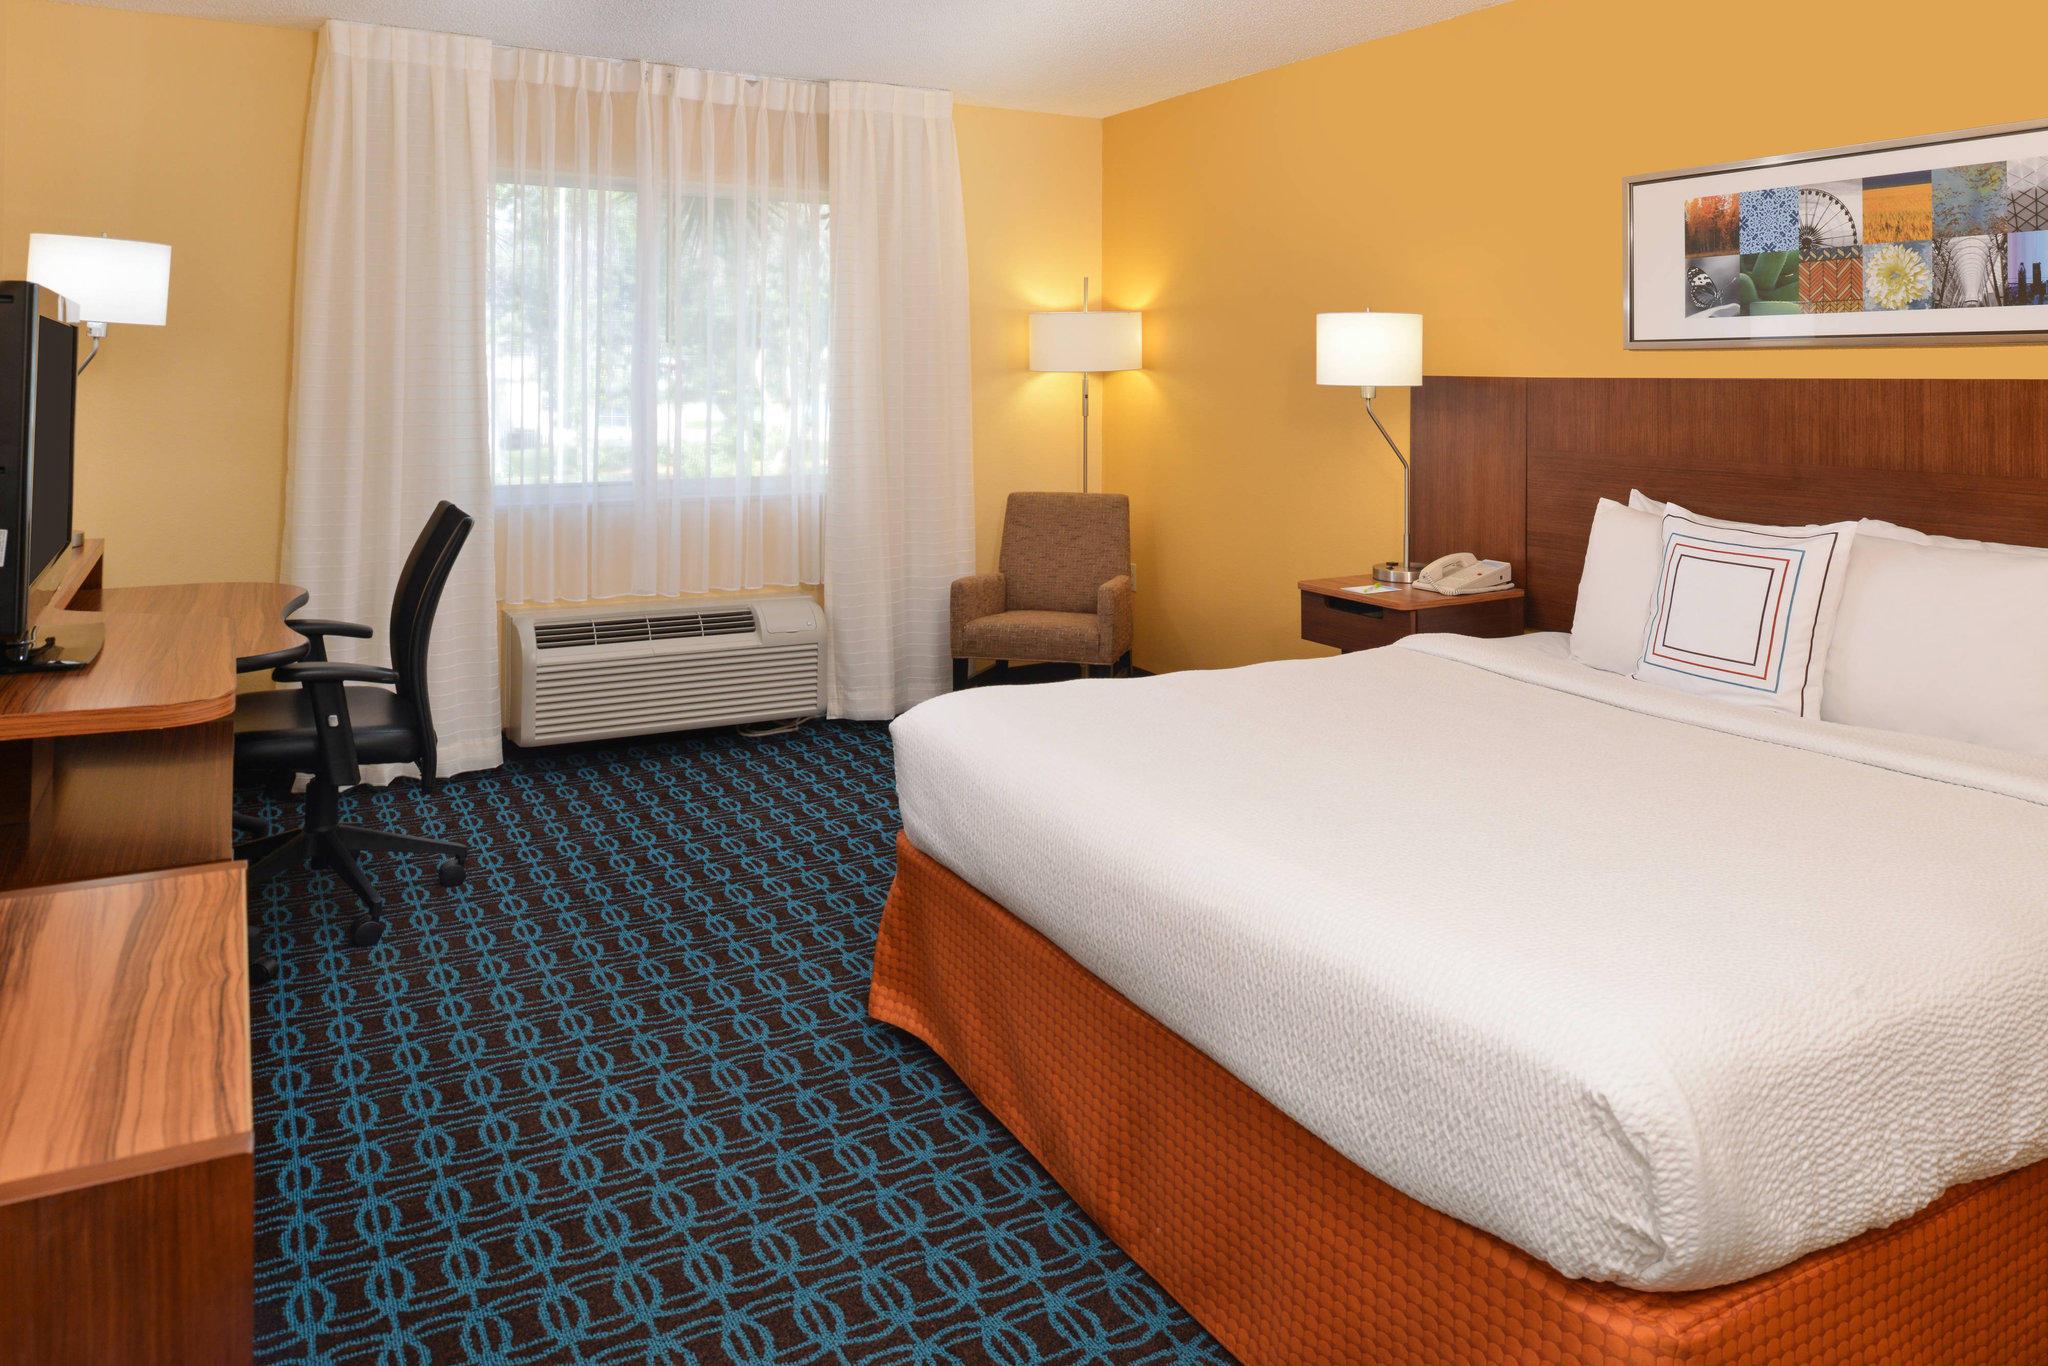 Fairfield Inn & Suites by Marriott Jacksonville Orange Park